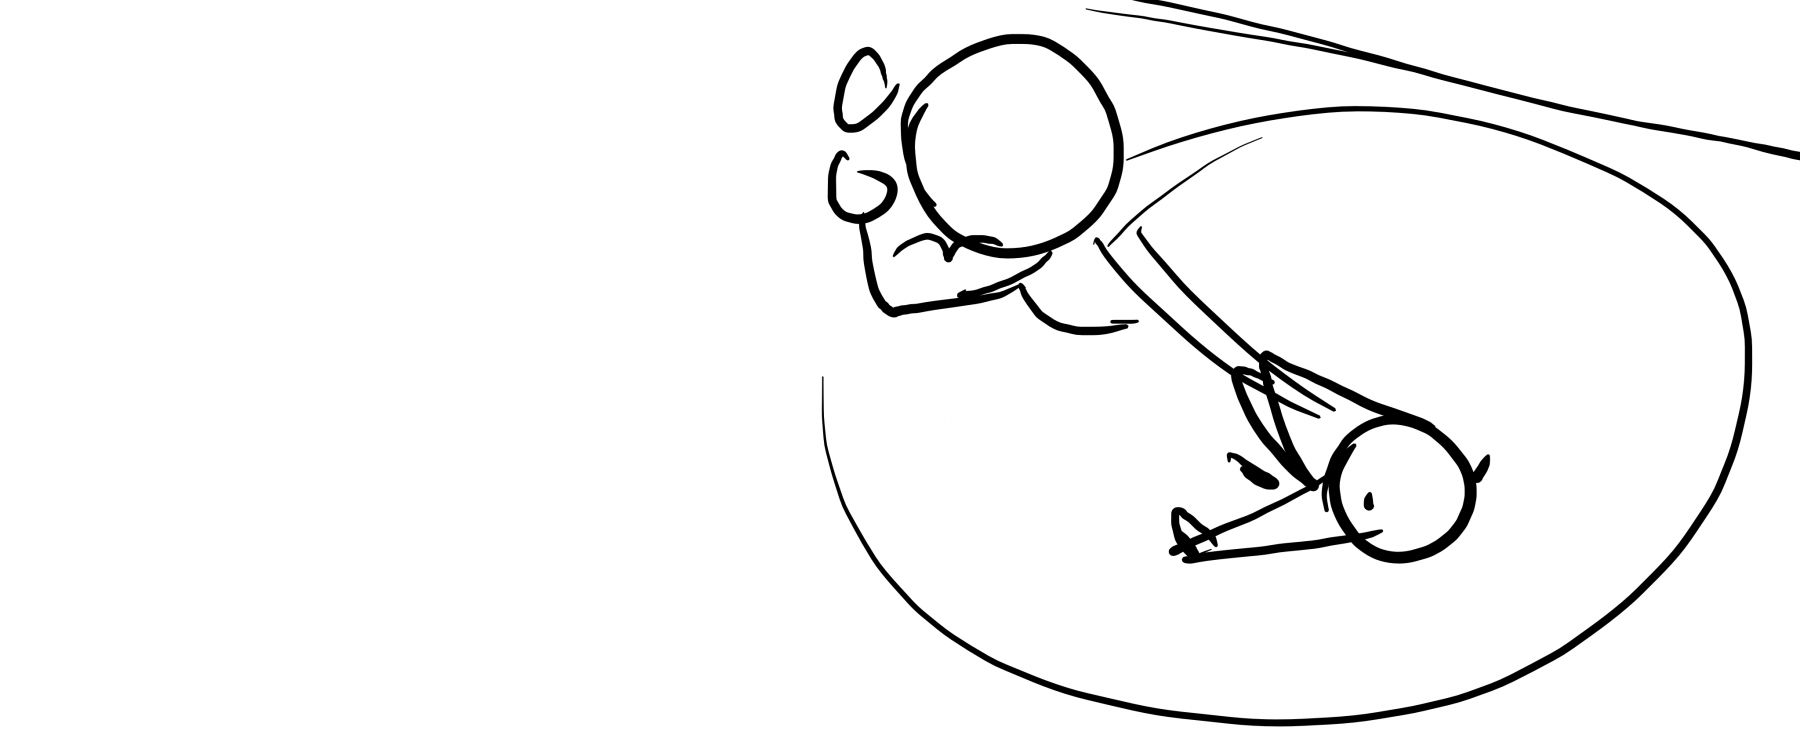 Nut-Thumbnail-Rough-Board00268